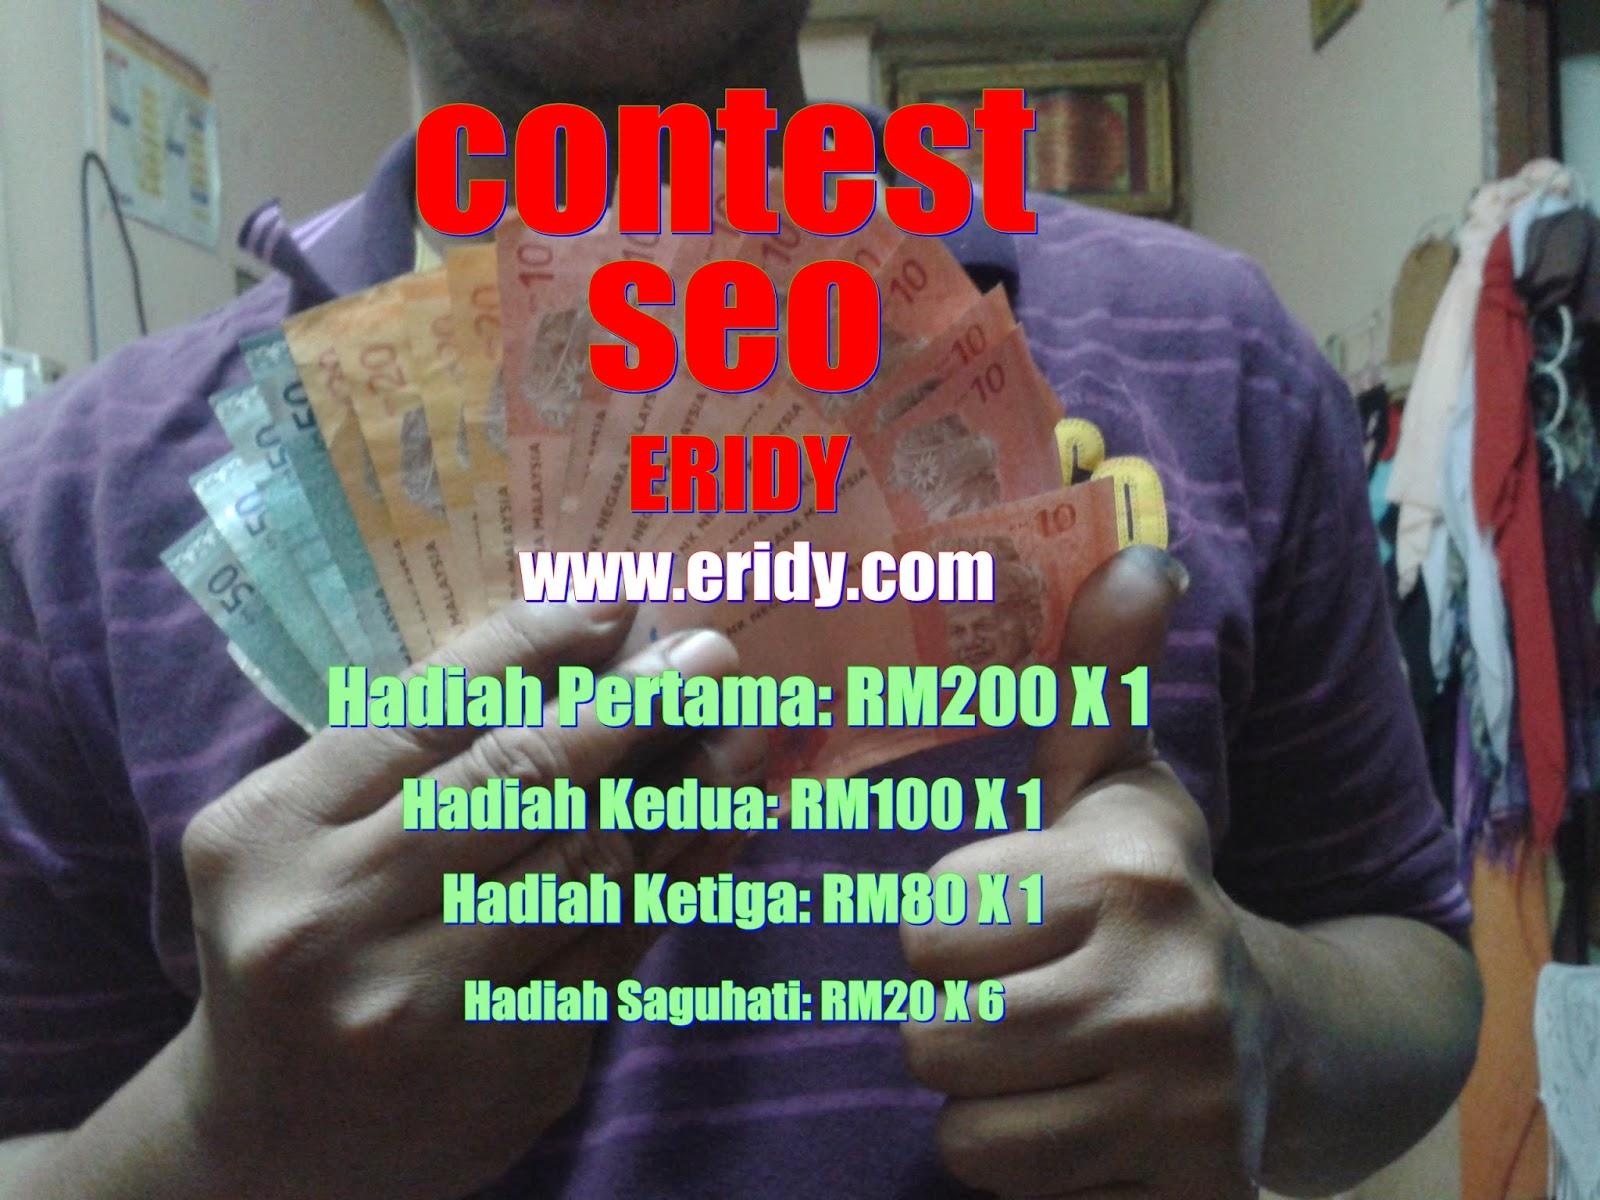 Contest Seo, anjuran Eridy, menang contest seo, teknik seo, tip seo, cara menang contest seo